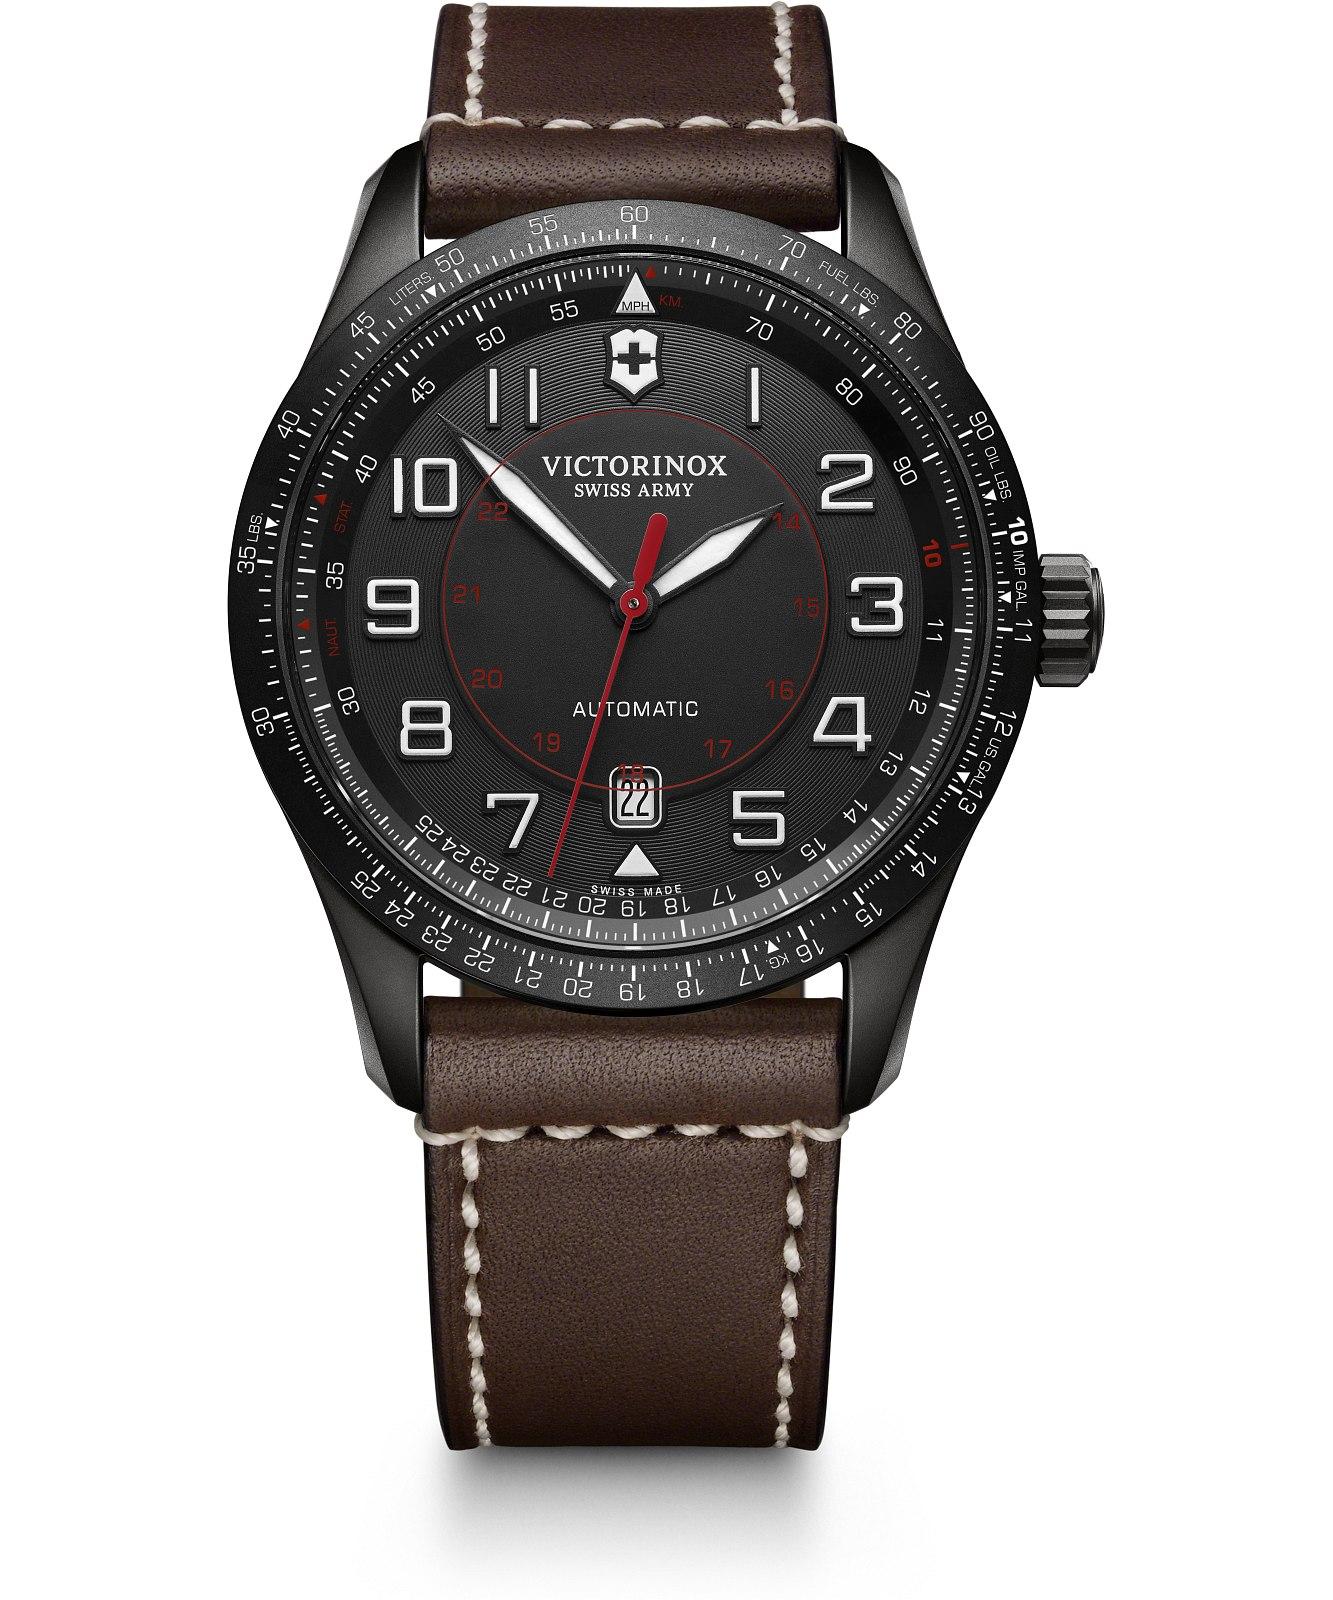 zegarek-meski-victorinox-airboss-3h-automatic-241821